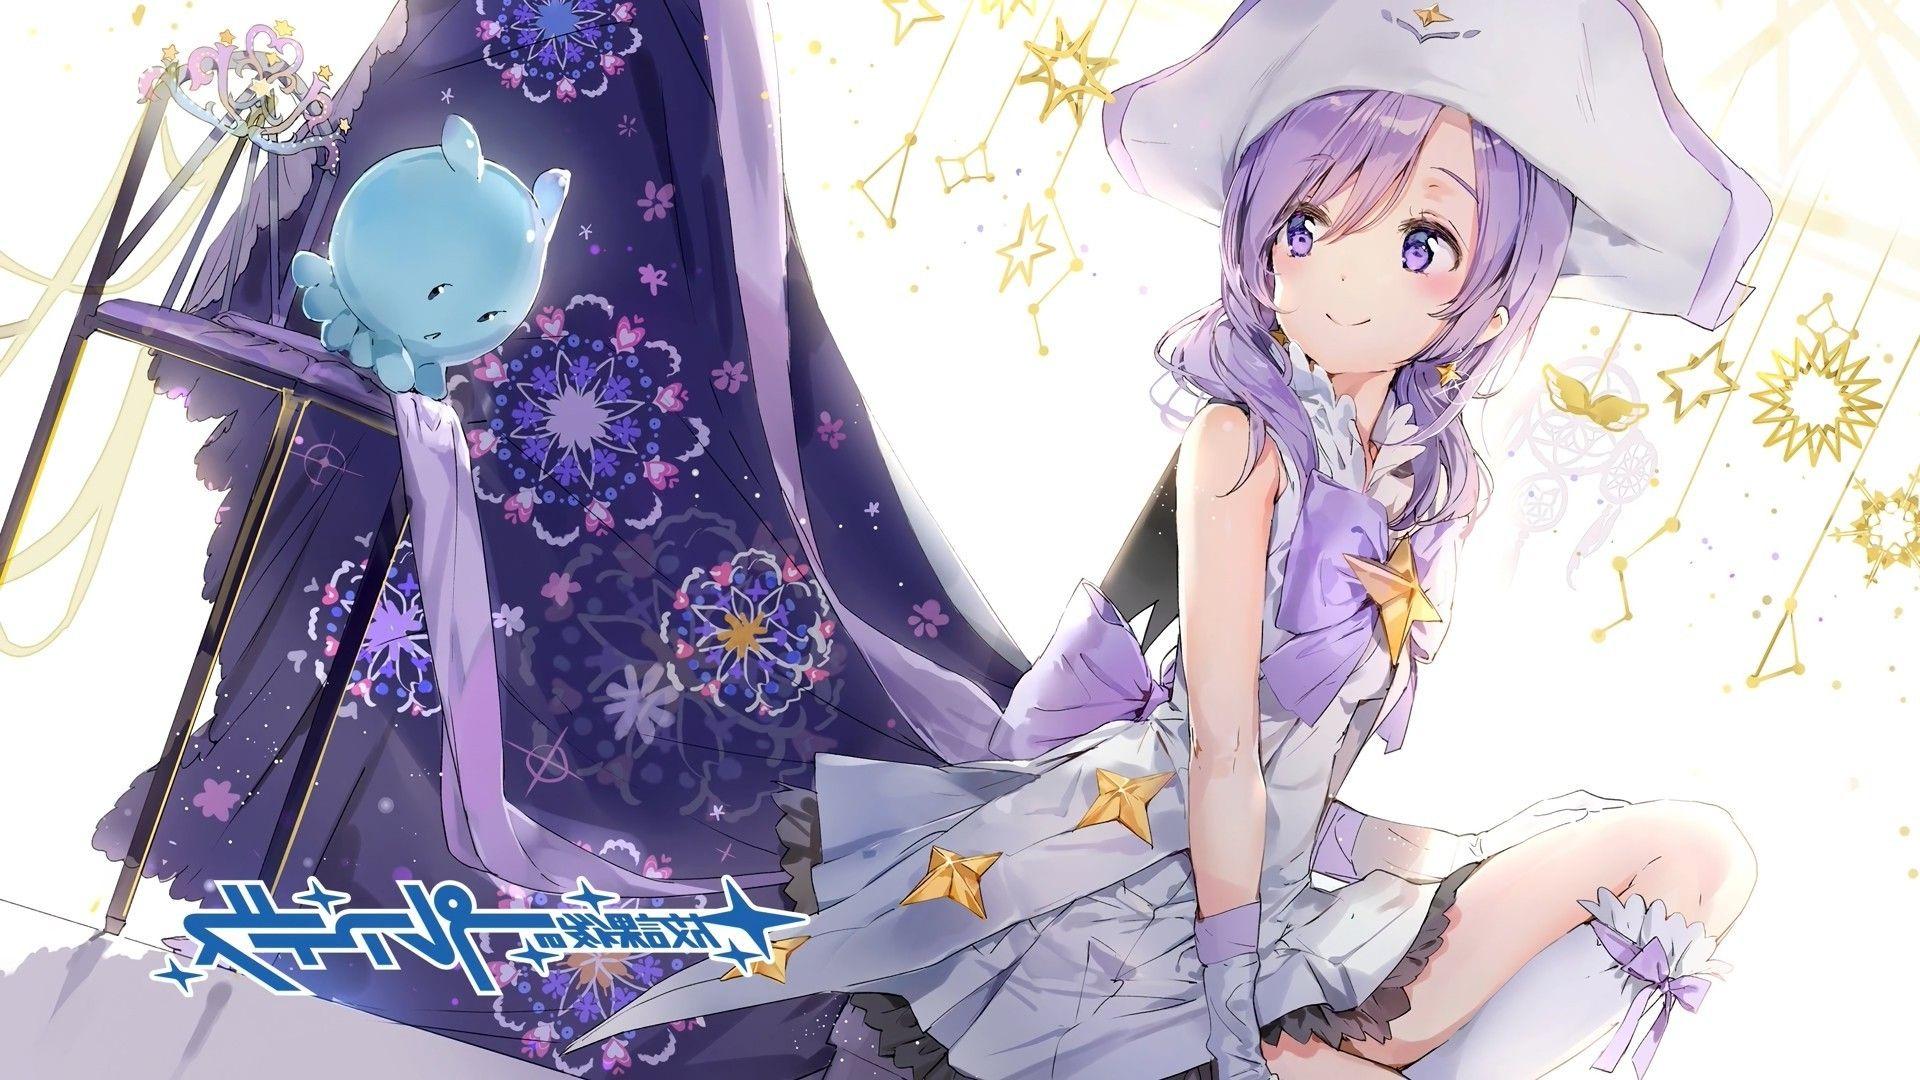 Sad Girl Anime HD desktop wallpaper Widescreen High